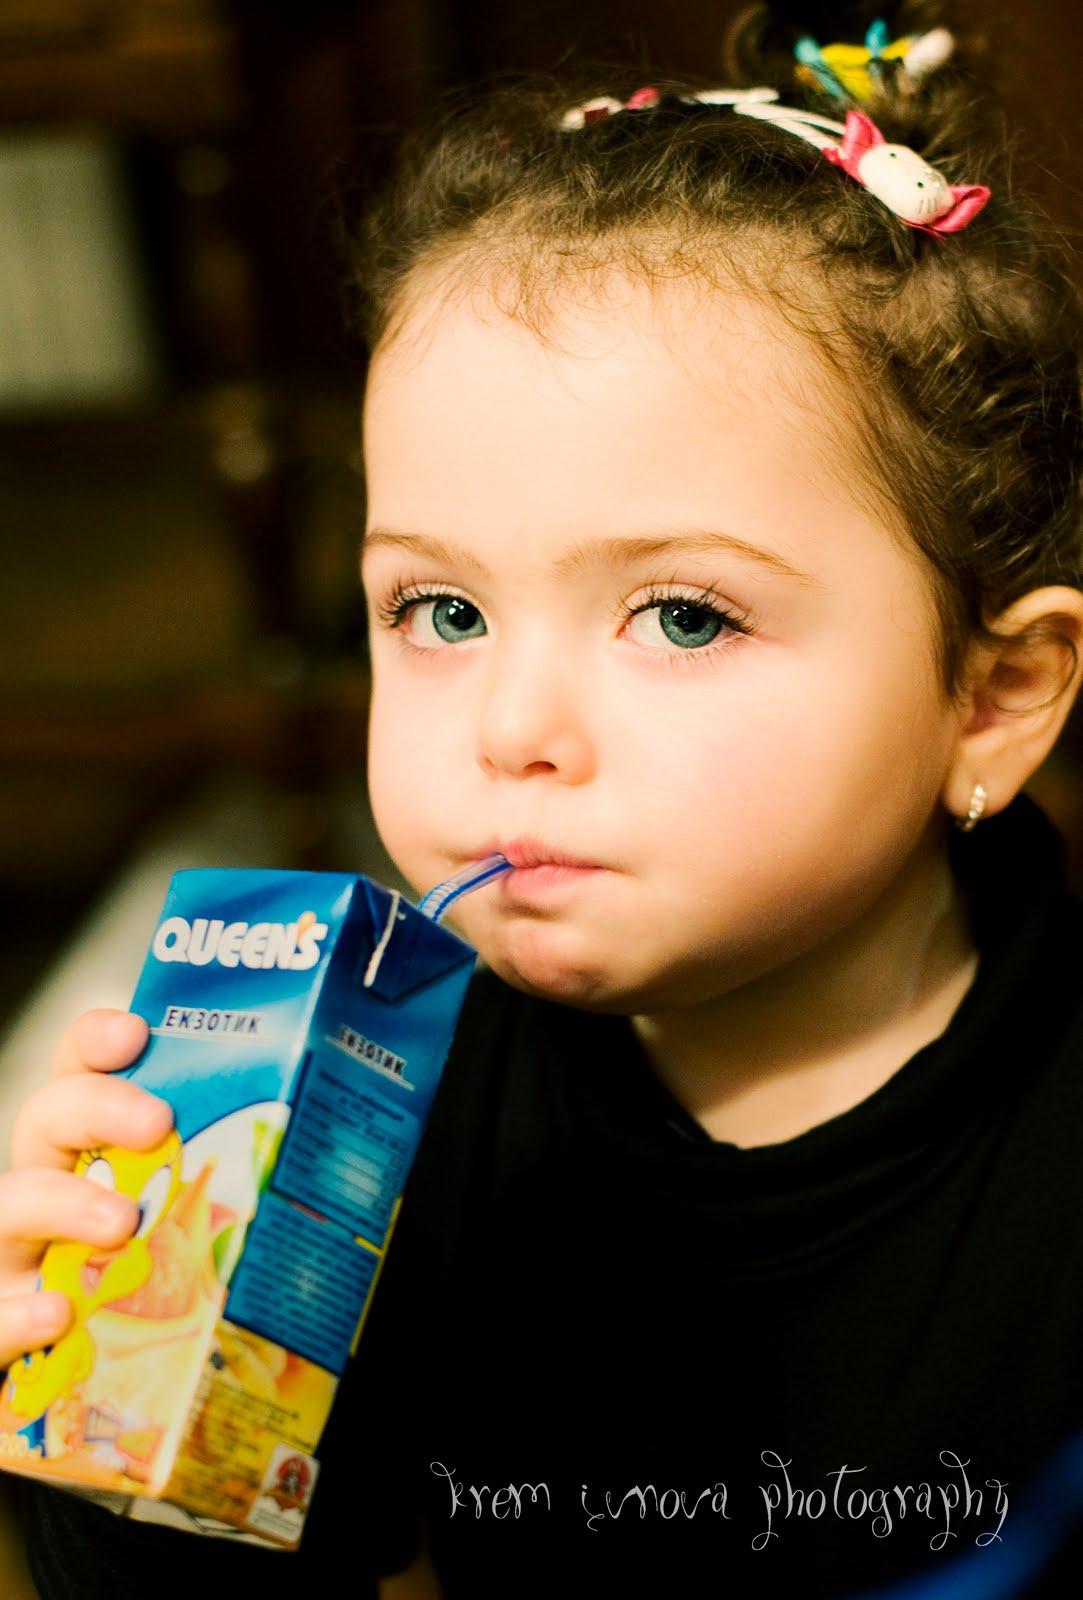 Фото ребенка в 5 недели беременности